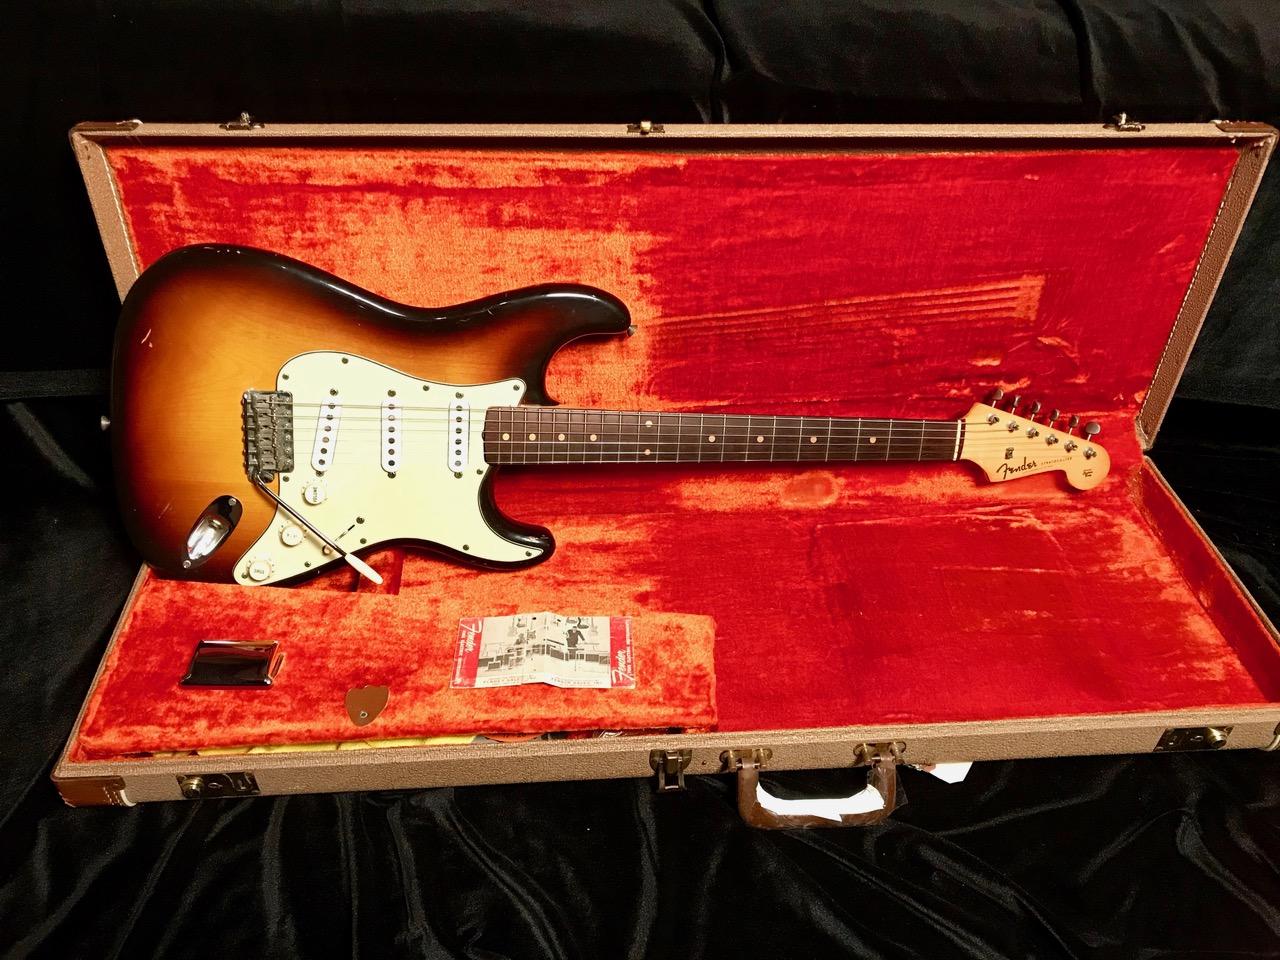 1959 Fender Slab Board Stratocaster (SN# 4378) 100% Original